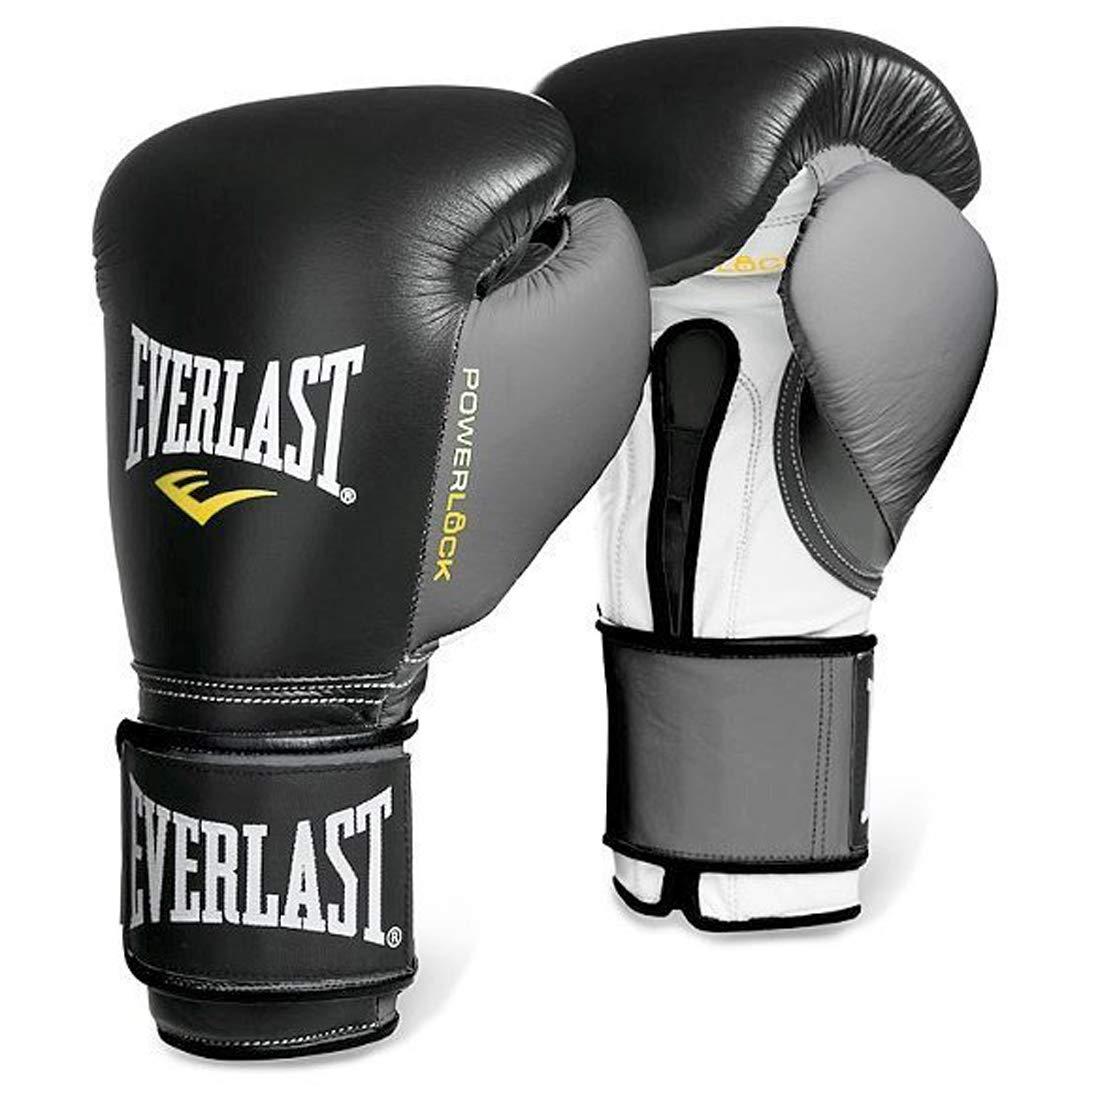 EverlastプレミアムレザーPowerlockフック&ループトレーニング手袋 ブラック/グレー 16oz